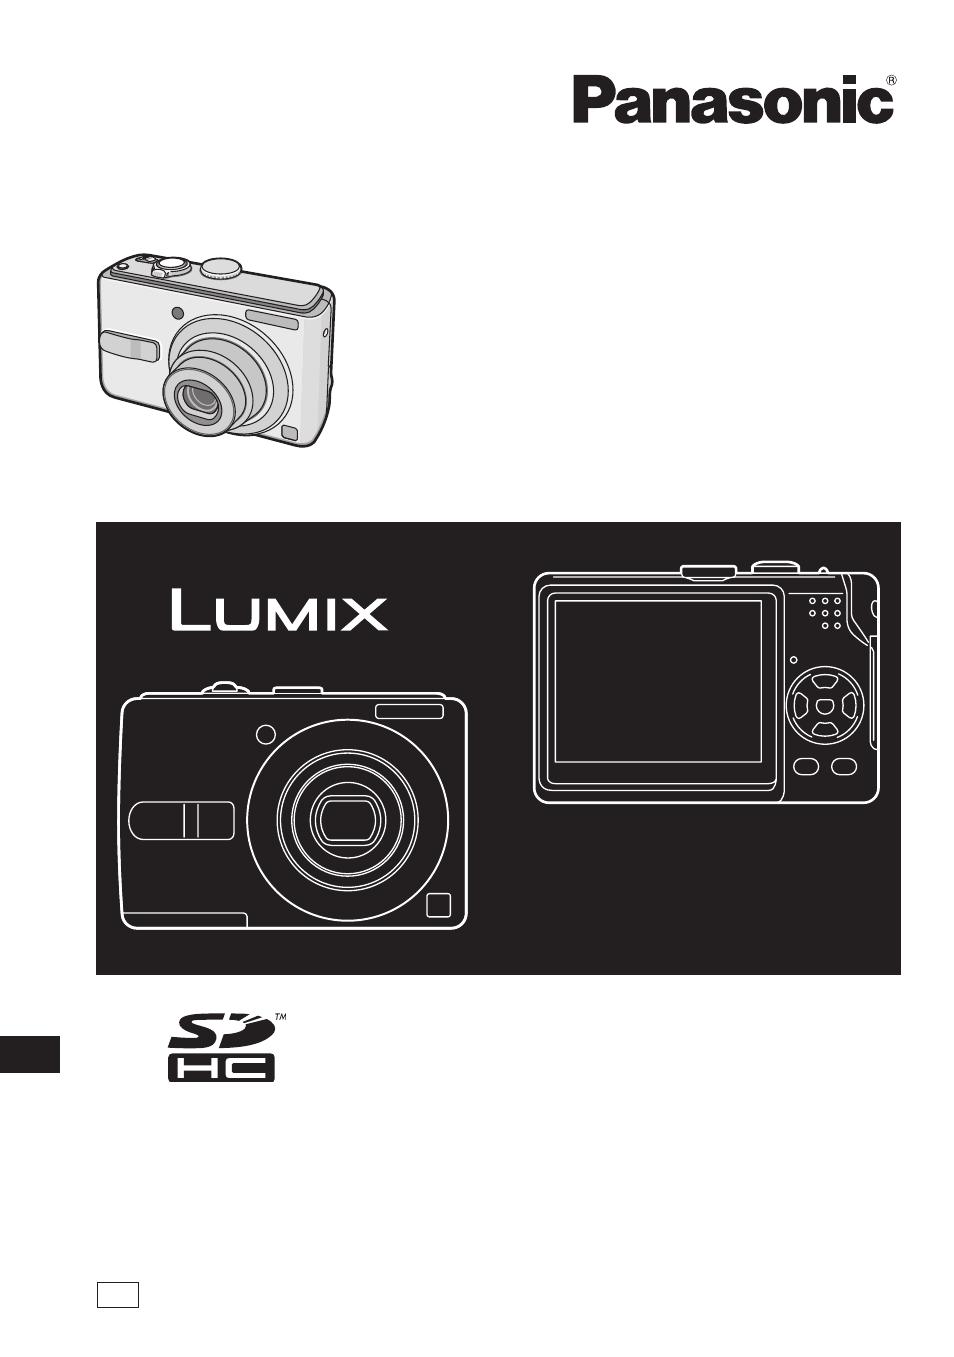 Panasonic DMC-LS75 User Manual | 112 pages | Also for: DMC-LS70, DMC-LS60